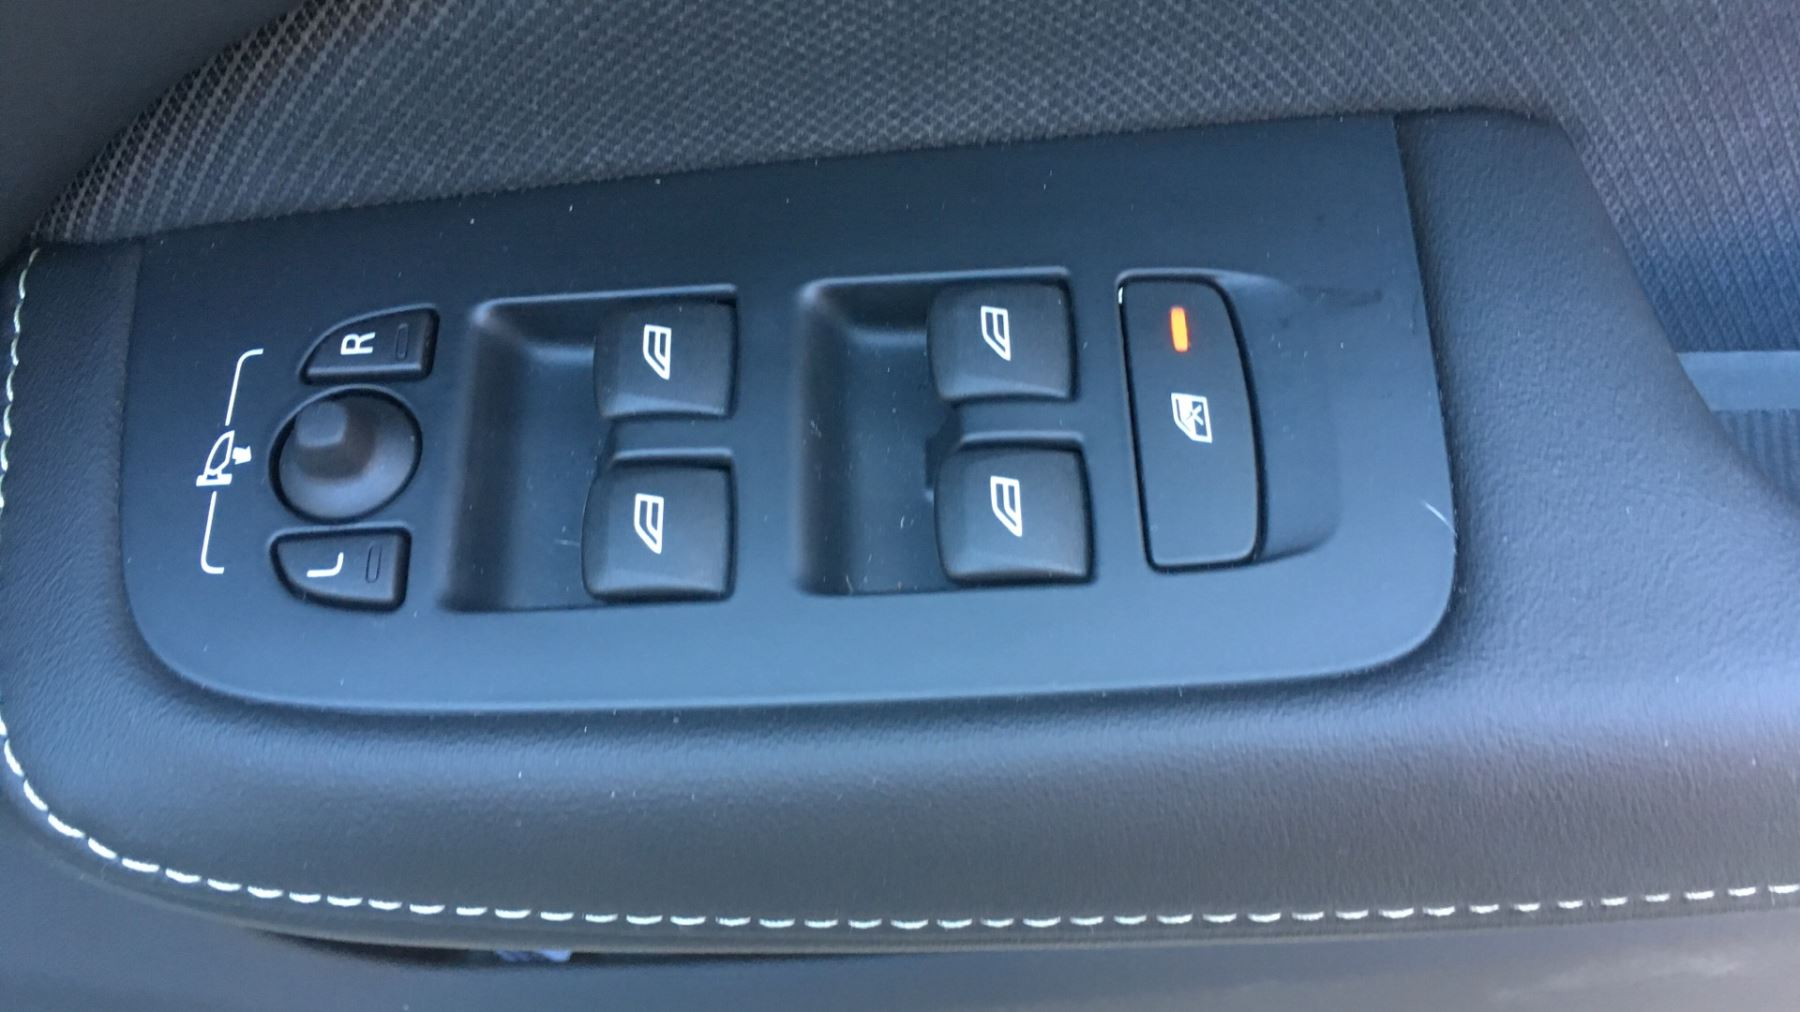 Volvo V60 2.0 D4 [190] R DESIGN 5dr - Volvo on Call, DAB Radio, SAT NAV, Park Assist image 12